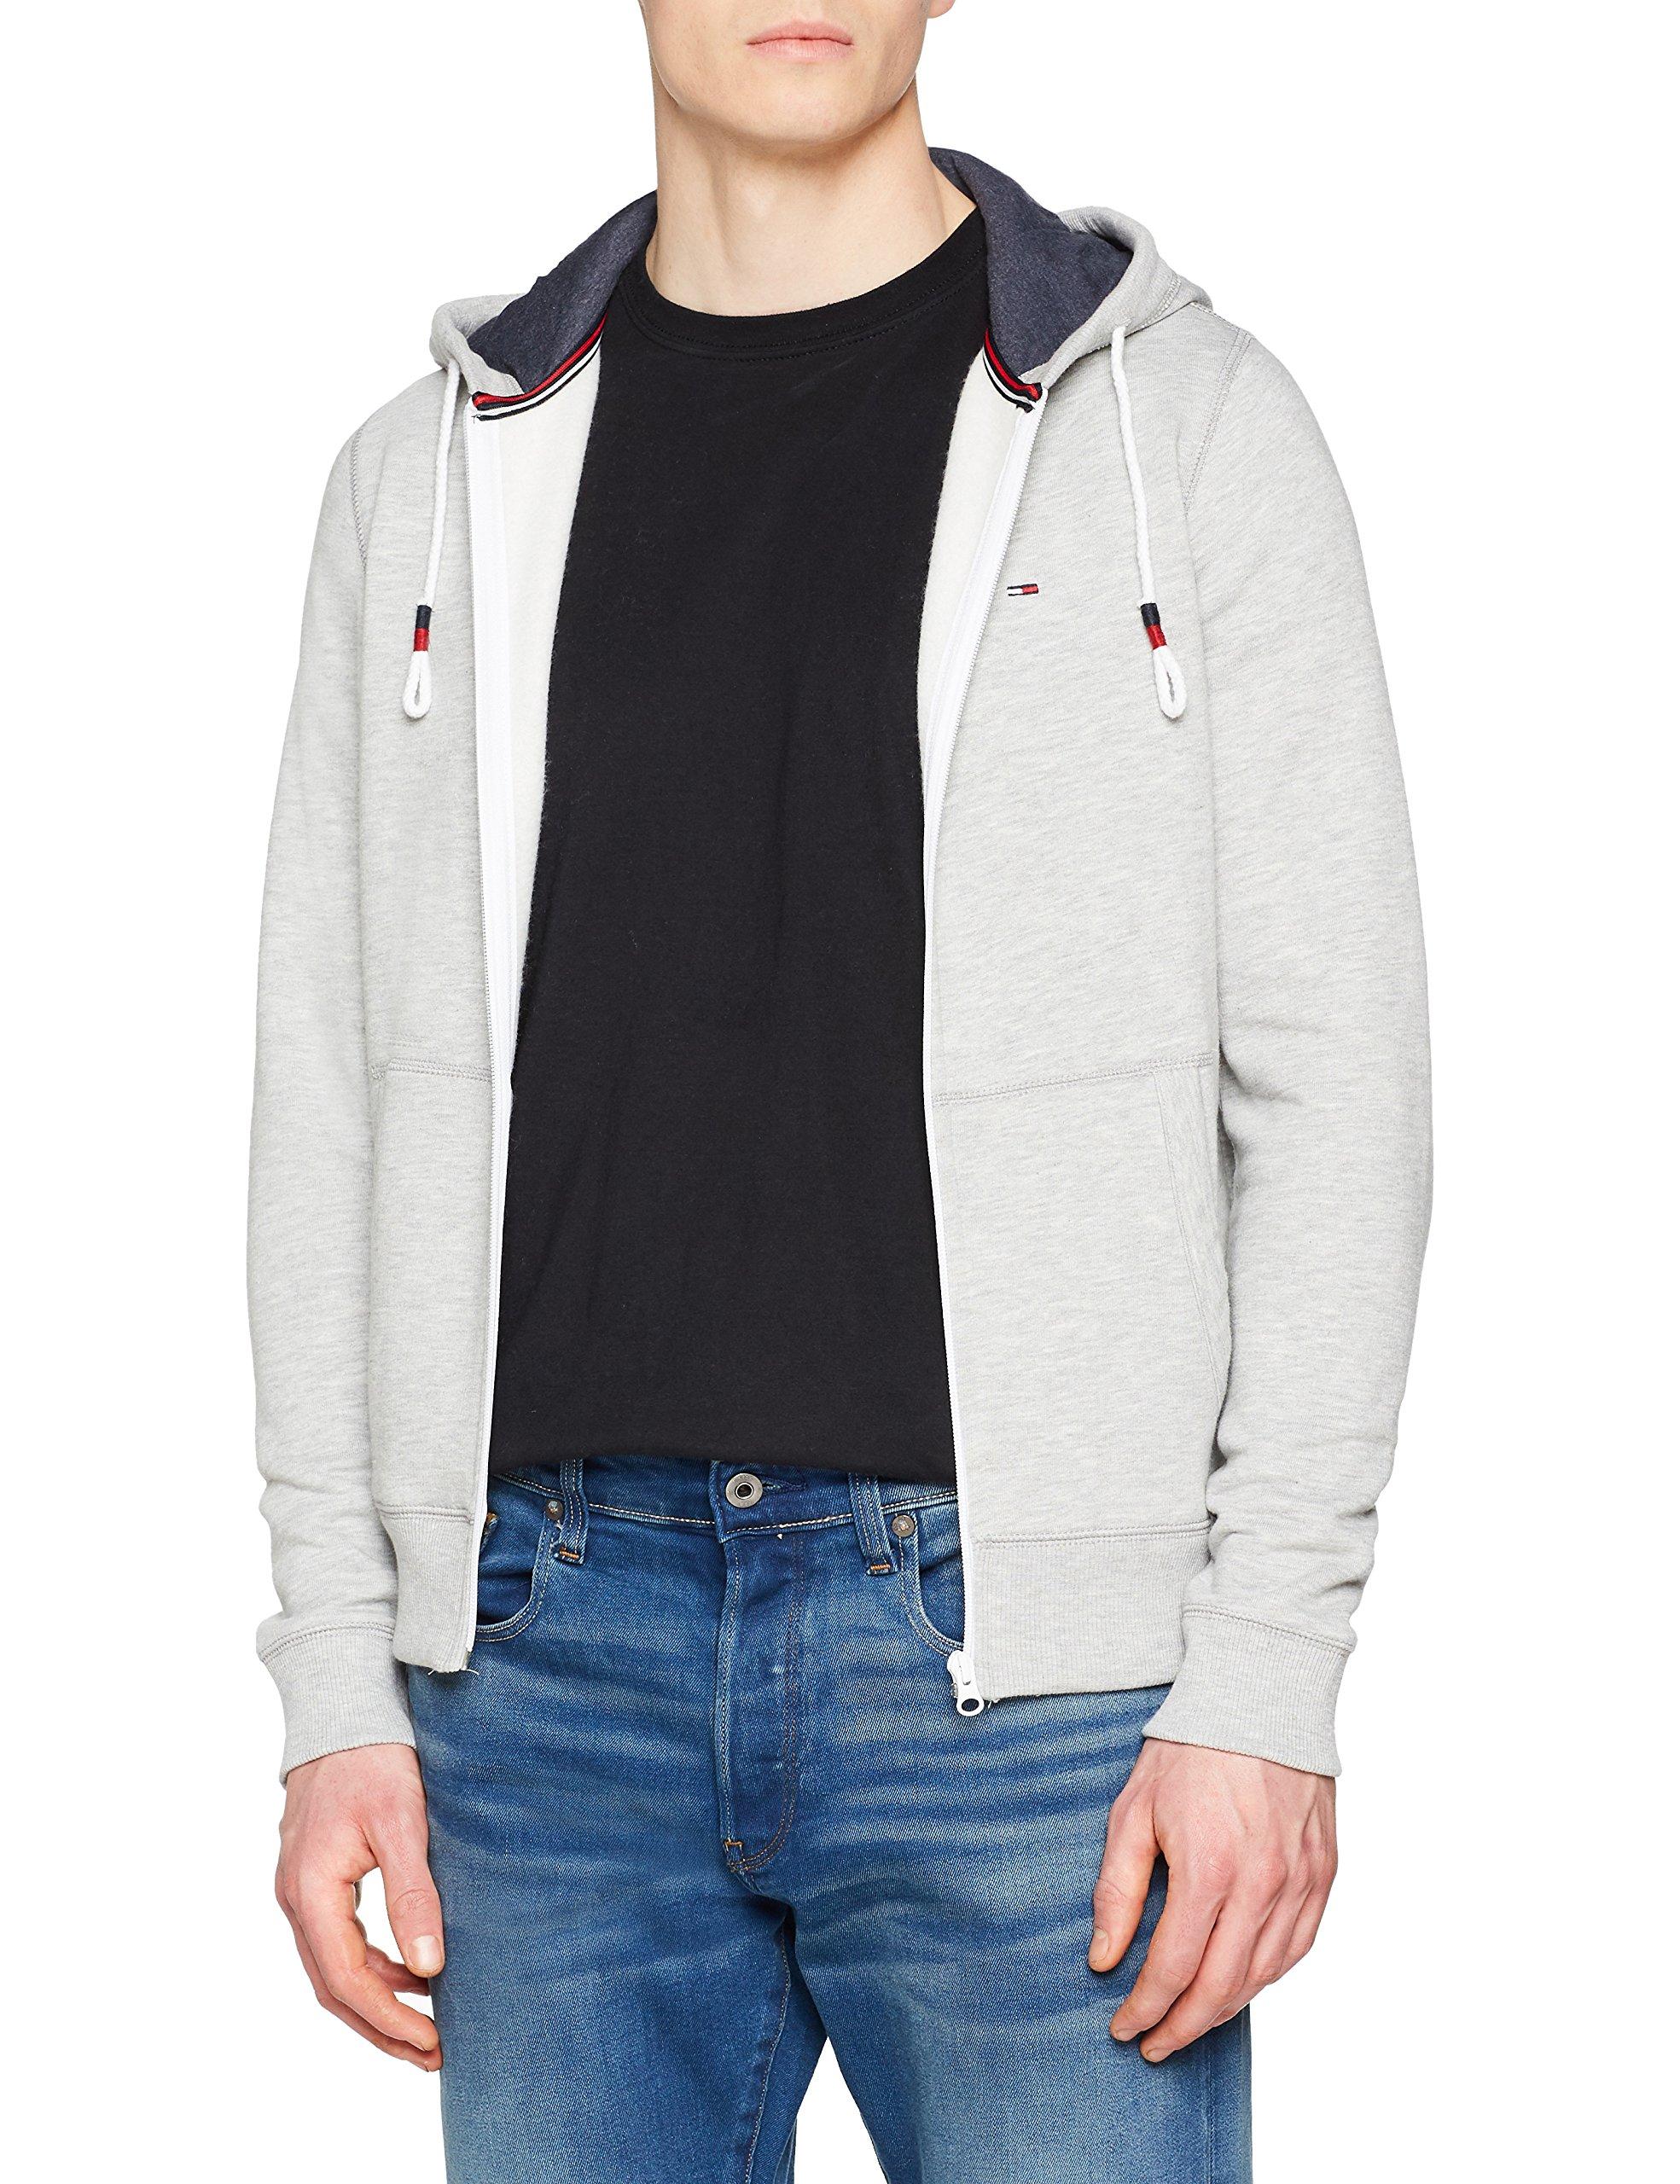 Zip Htr Homme Original Grey Sweat Hoodie Longues Tommy Grislt shirt Manches 038X Jeans small 8kN0PZnXOw